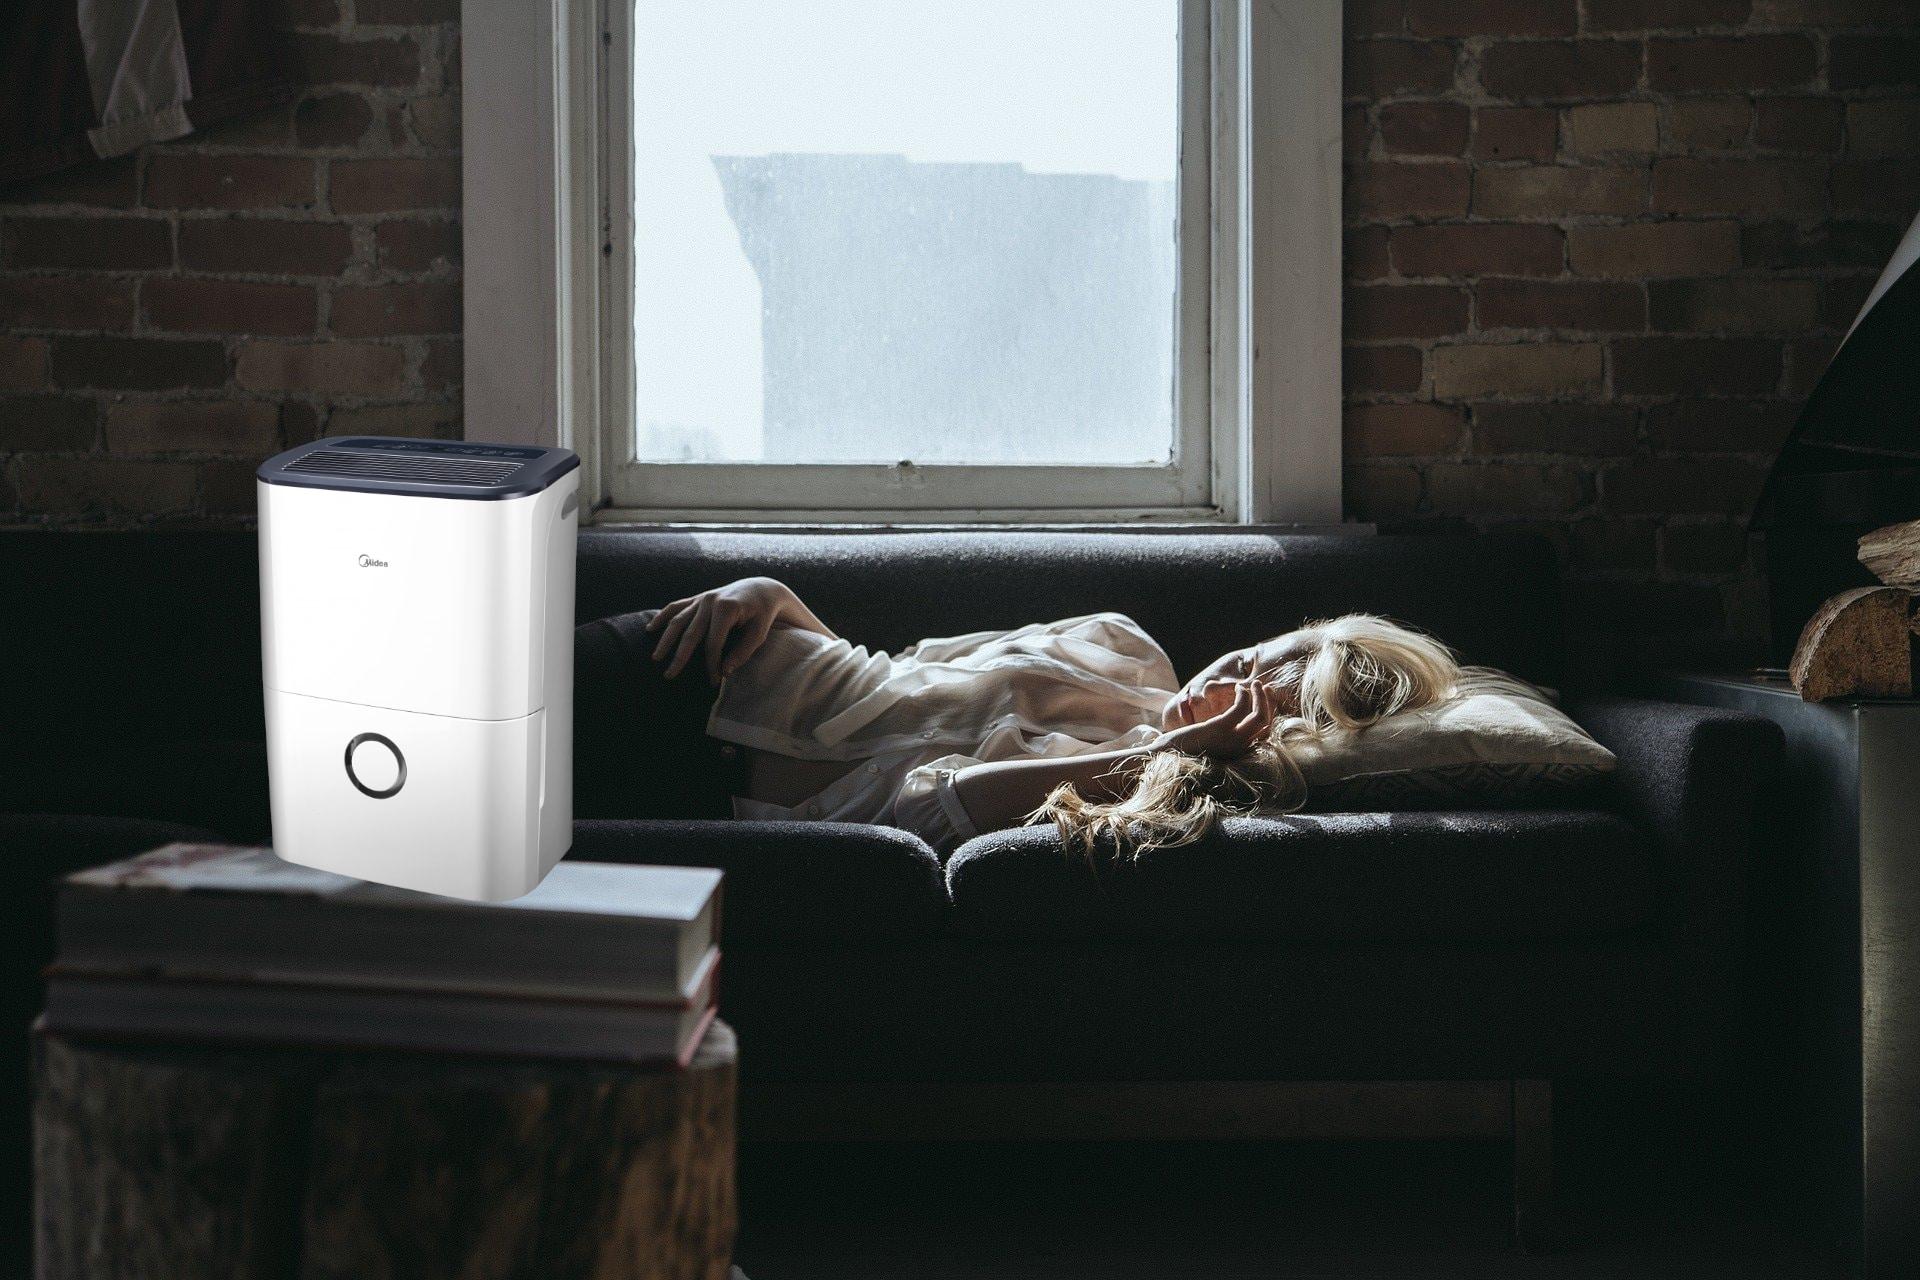 Dormir con humidificador